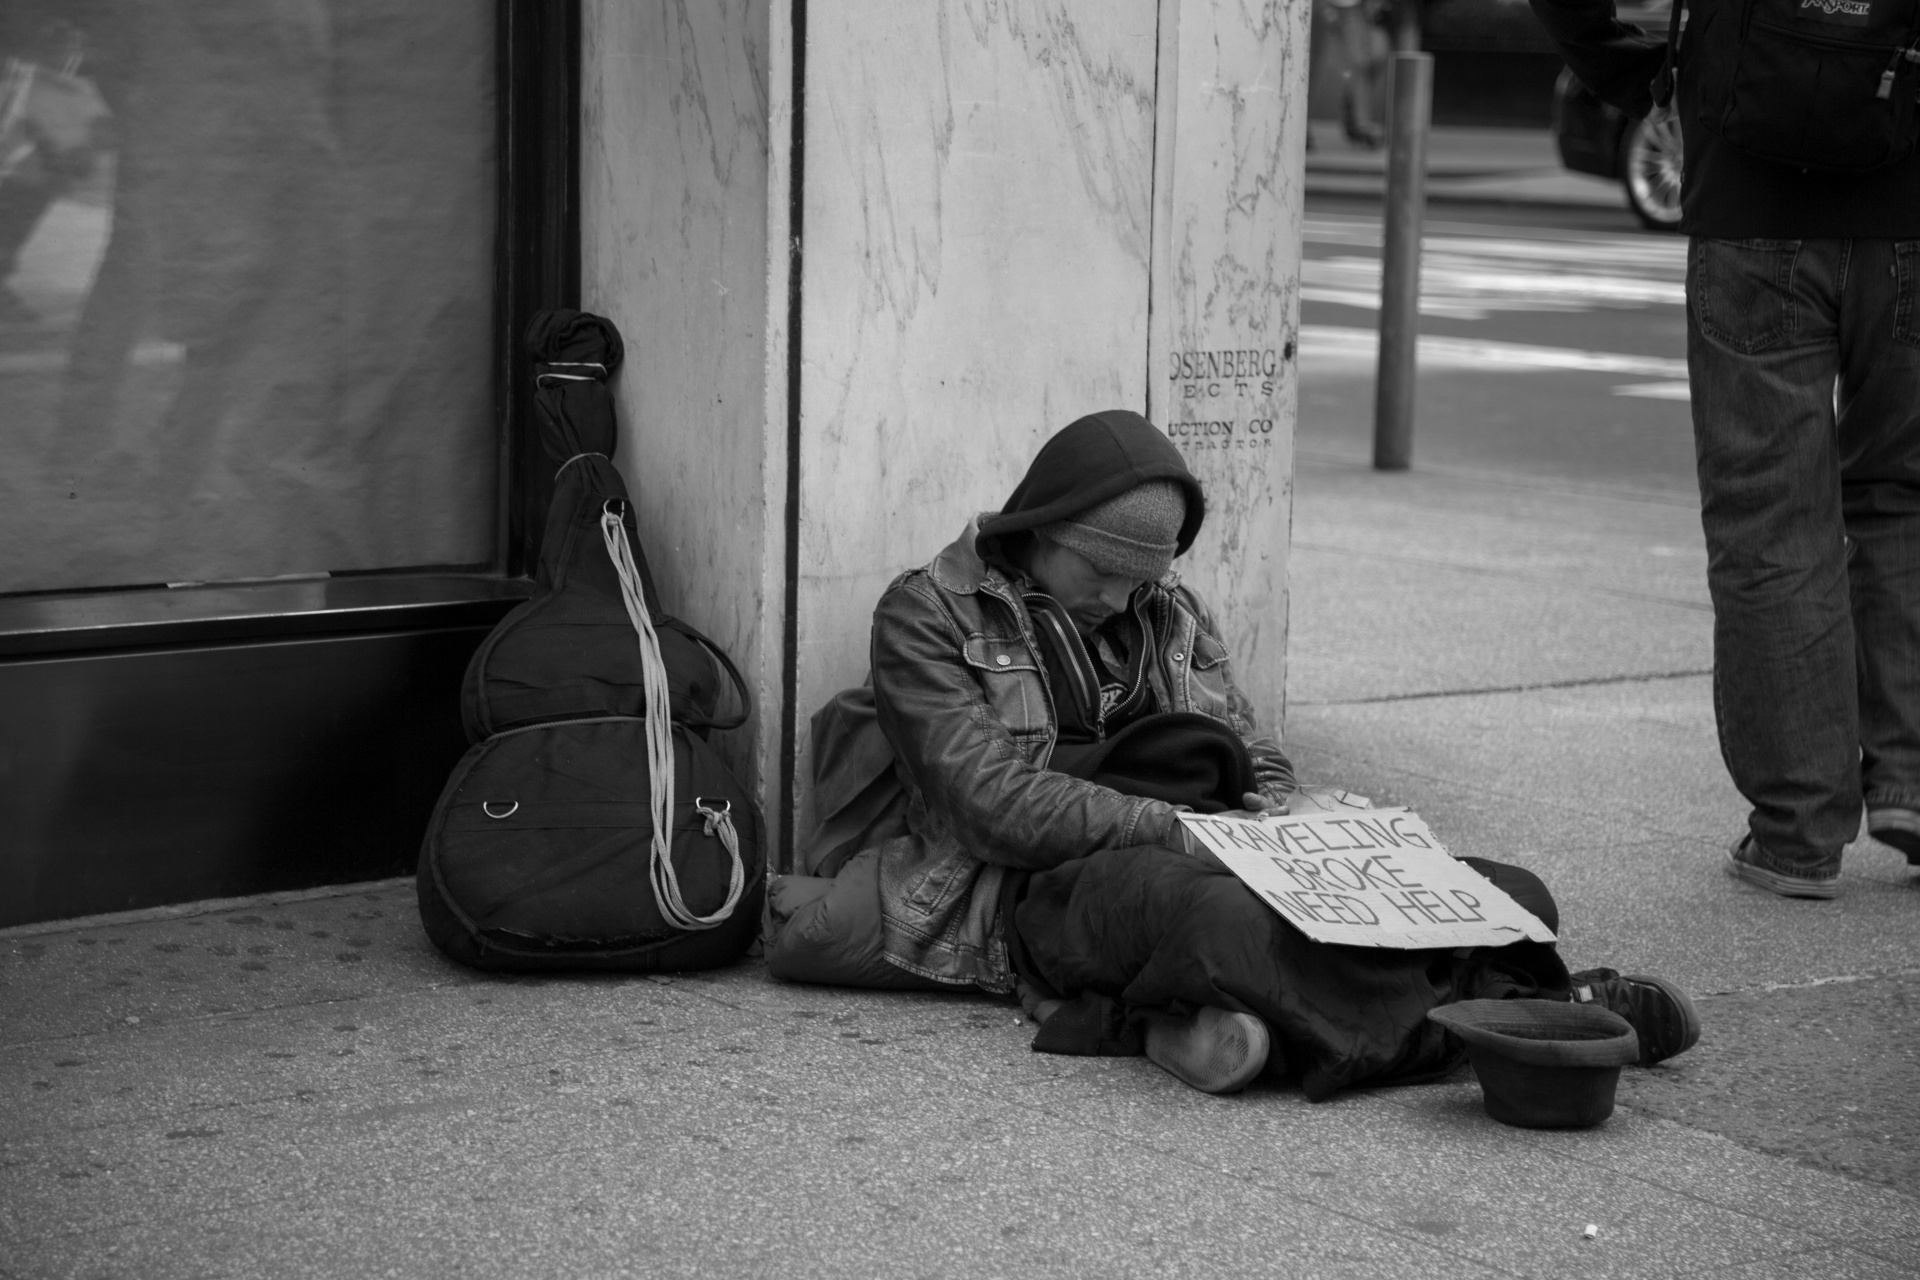 Addressing America's Homeless Problem